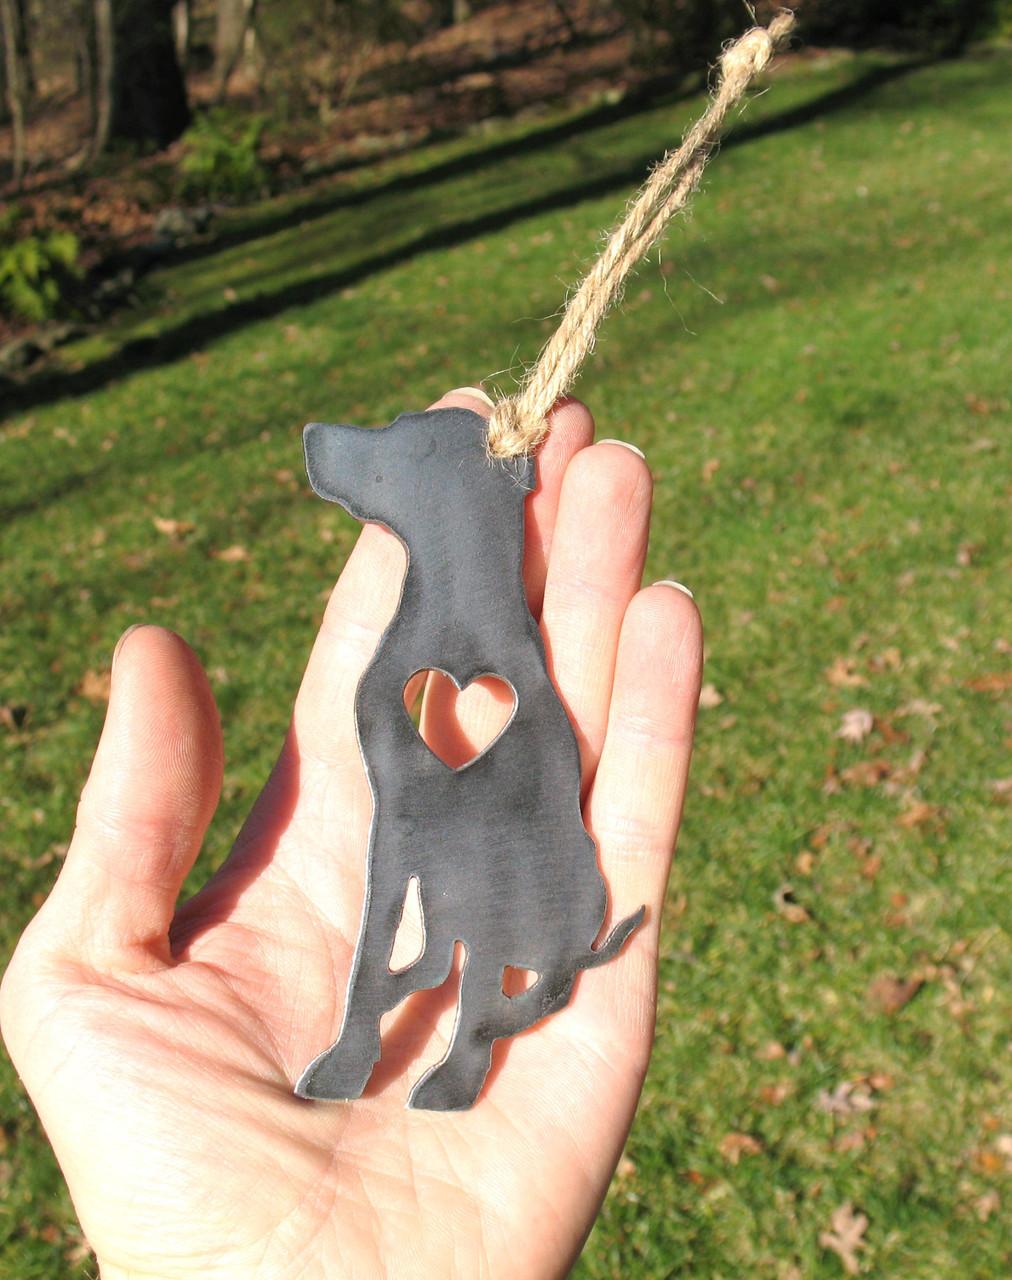 German Shorthaired Pointer Dog Ornament 2 - Metal Dog Christmas Ornament - Pet Lover Memorial Ornament - Pet Loss Dog Memorial Ornament Gift